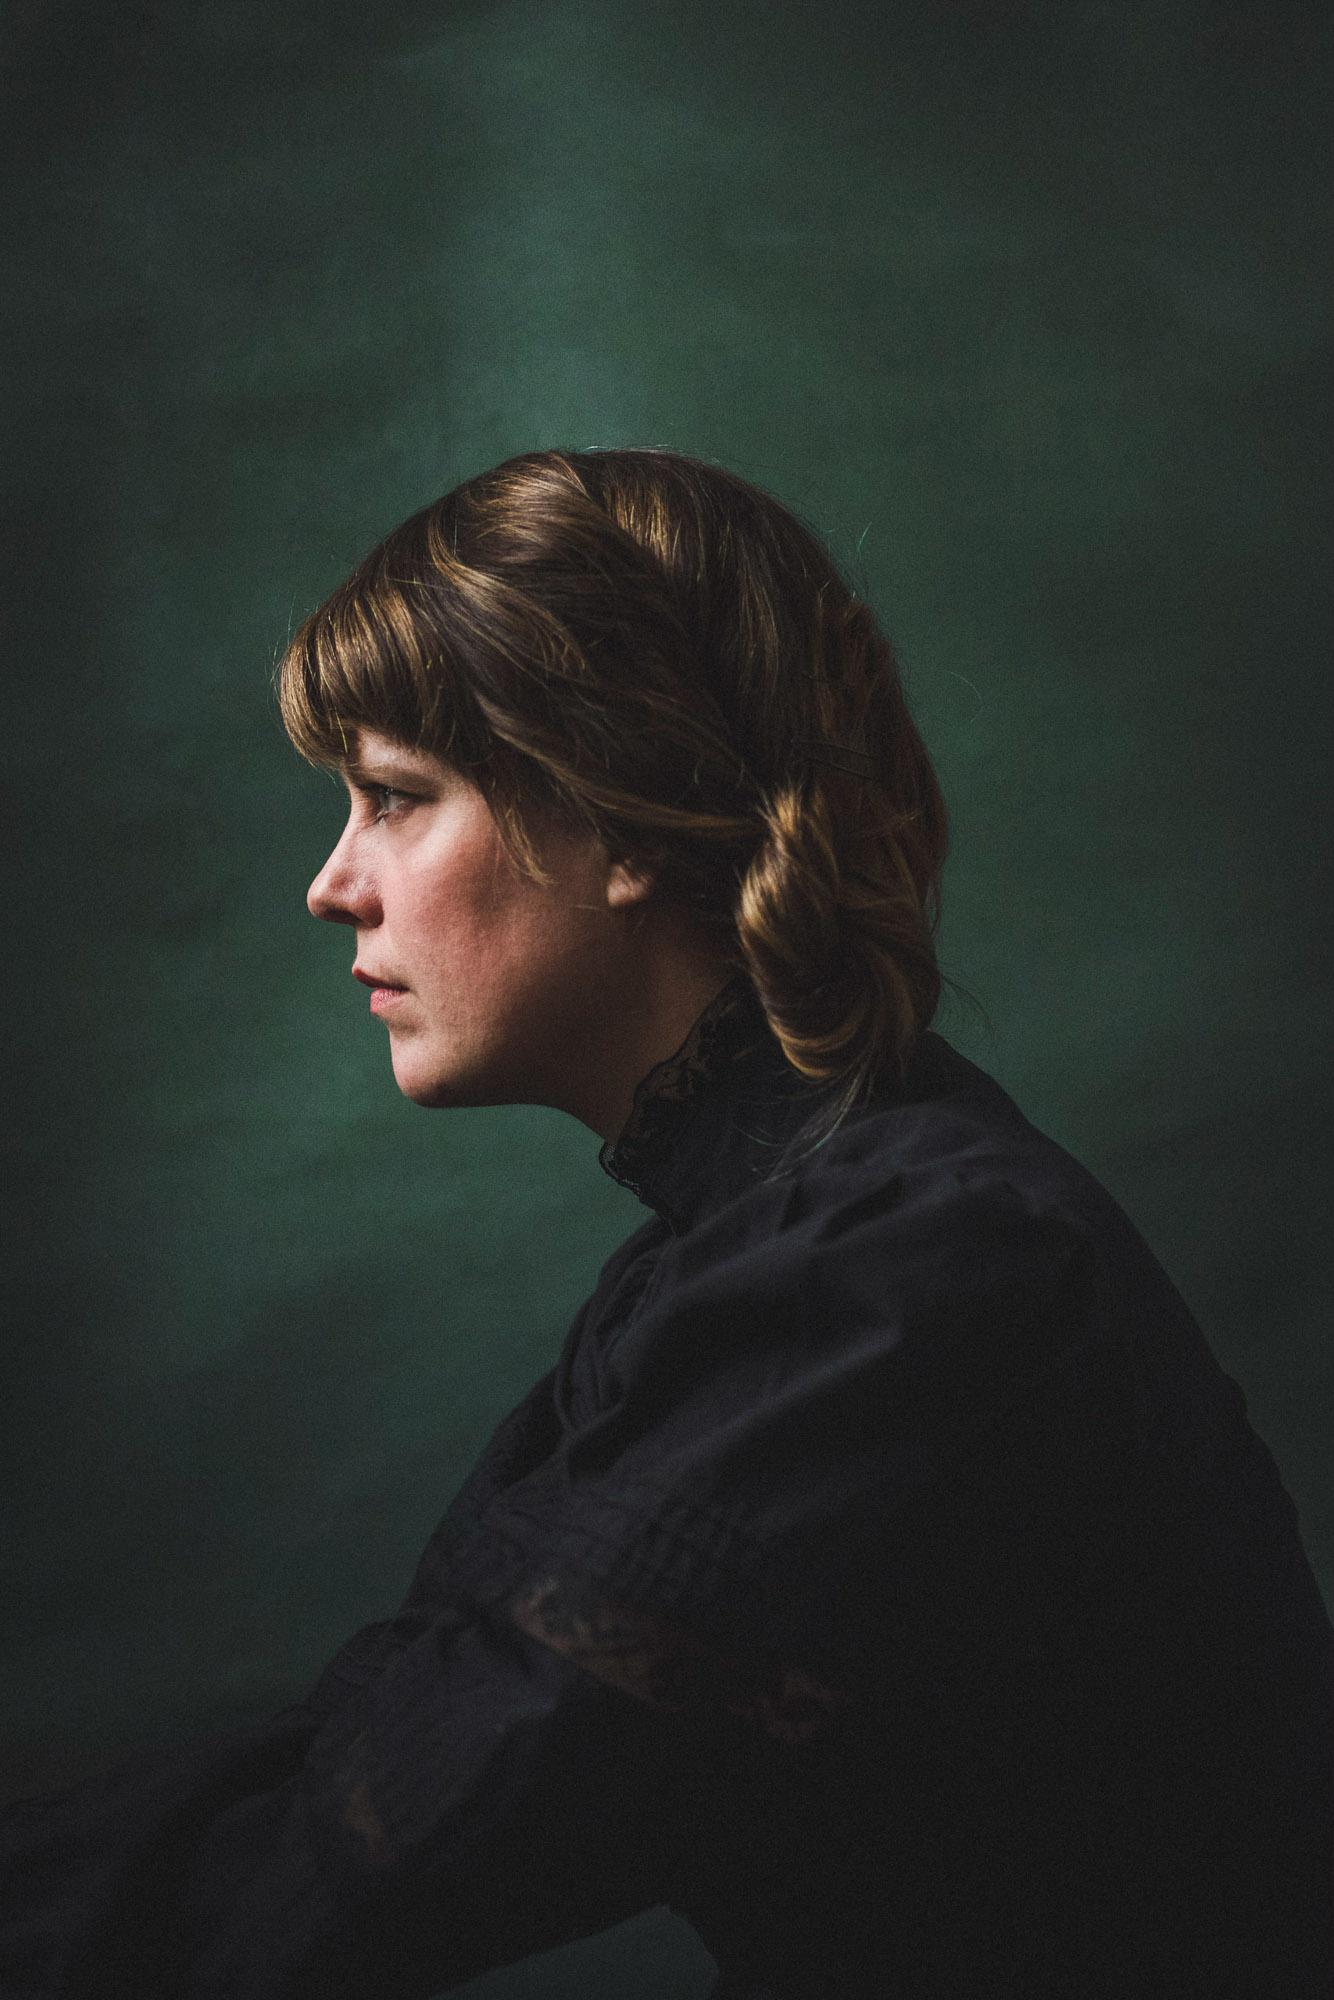 clea-minaker-portrait-by-alex-tran-photography